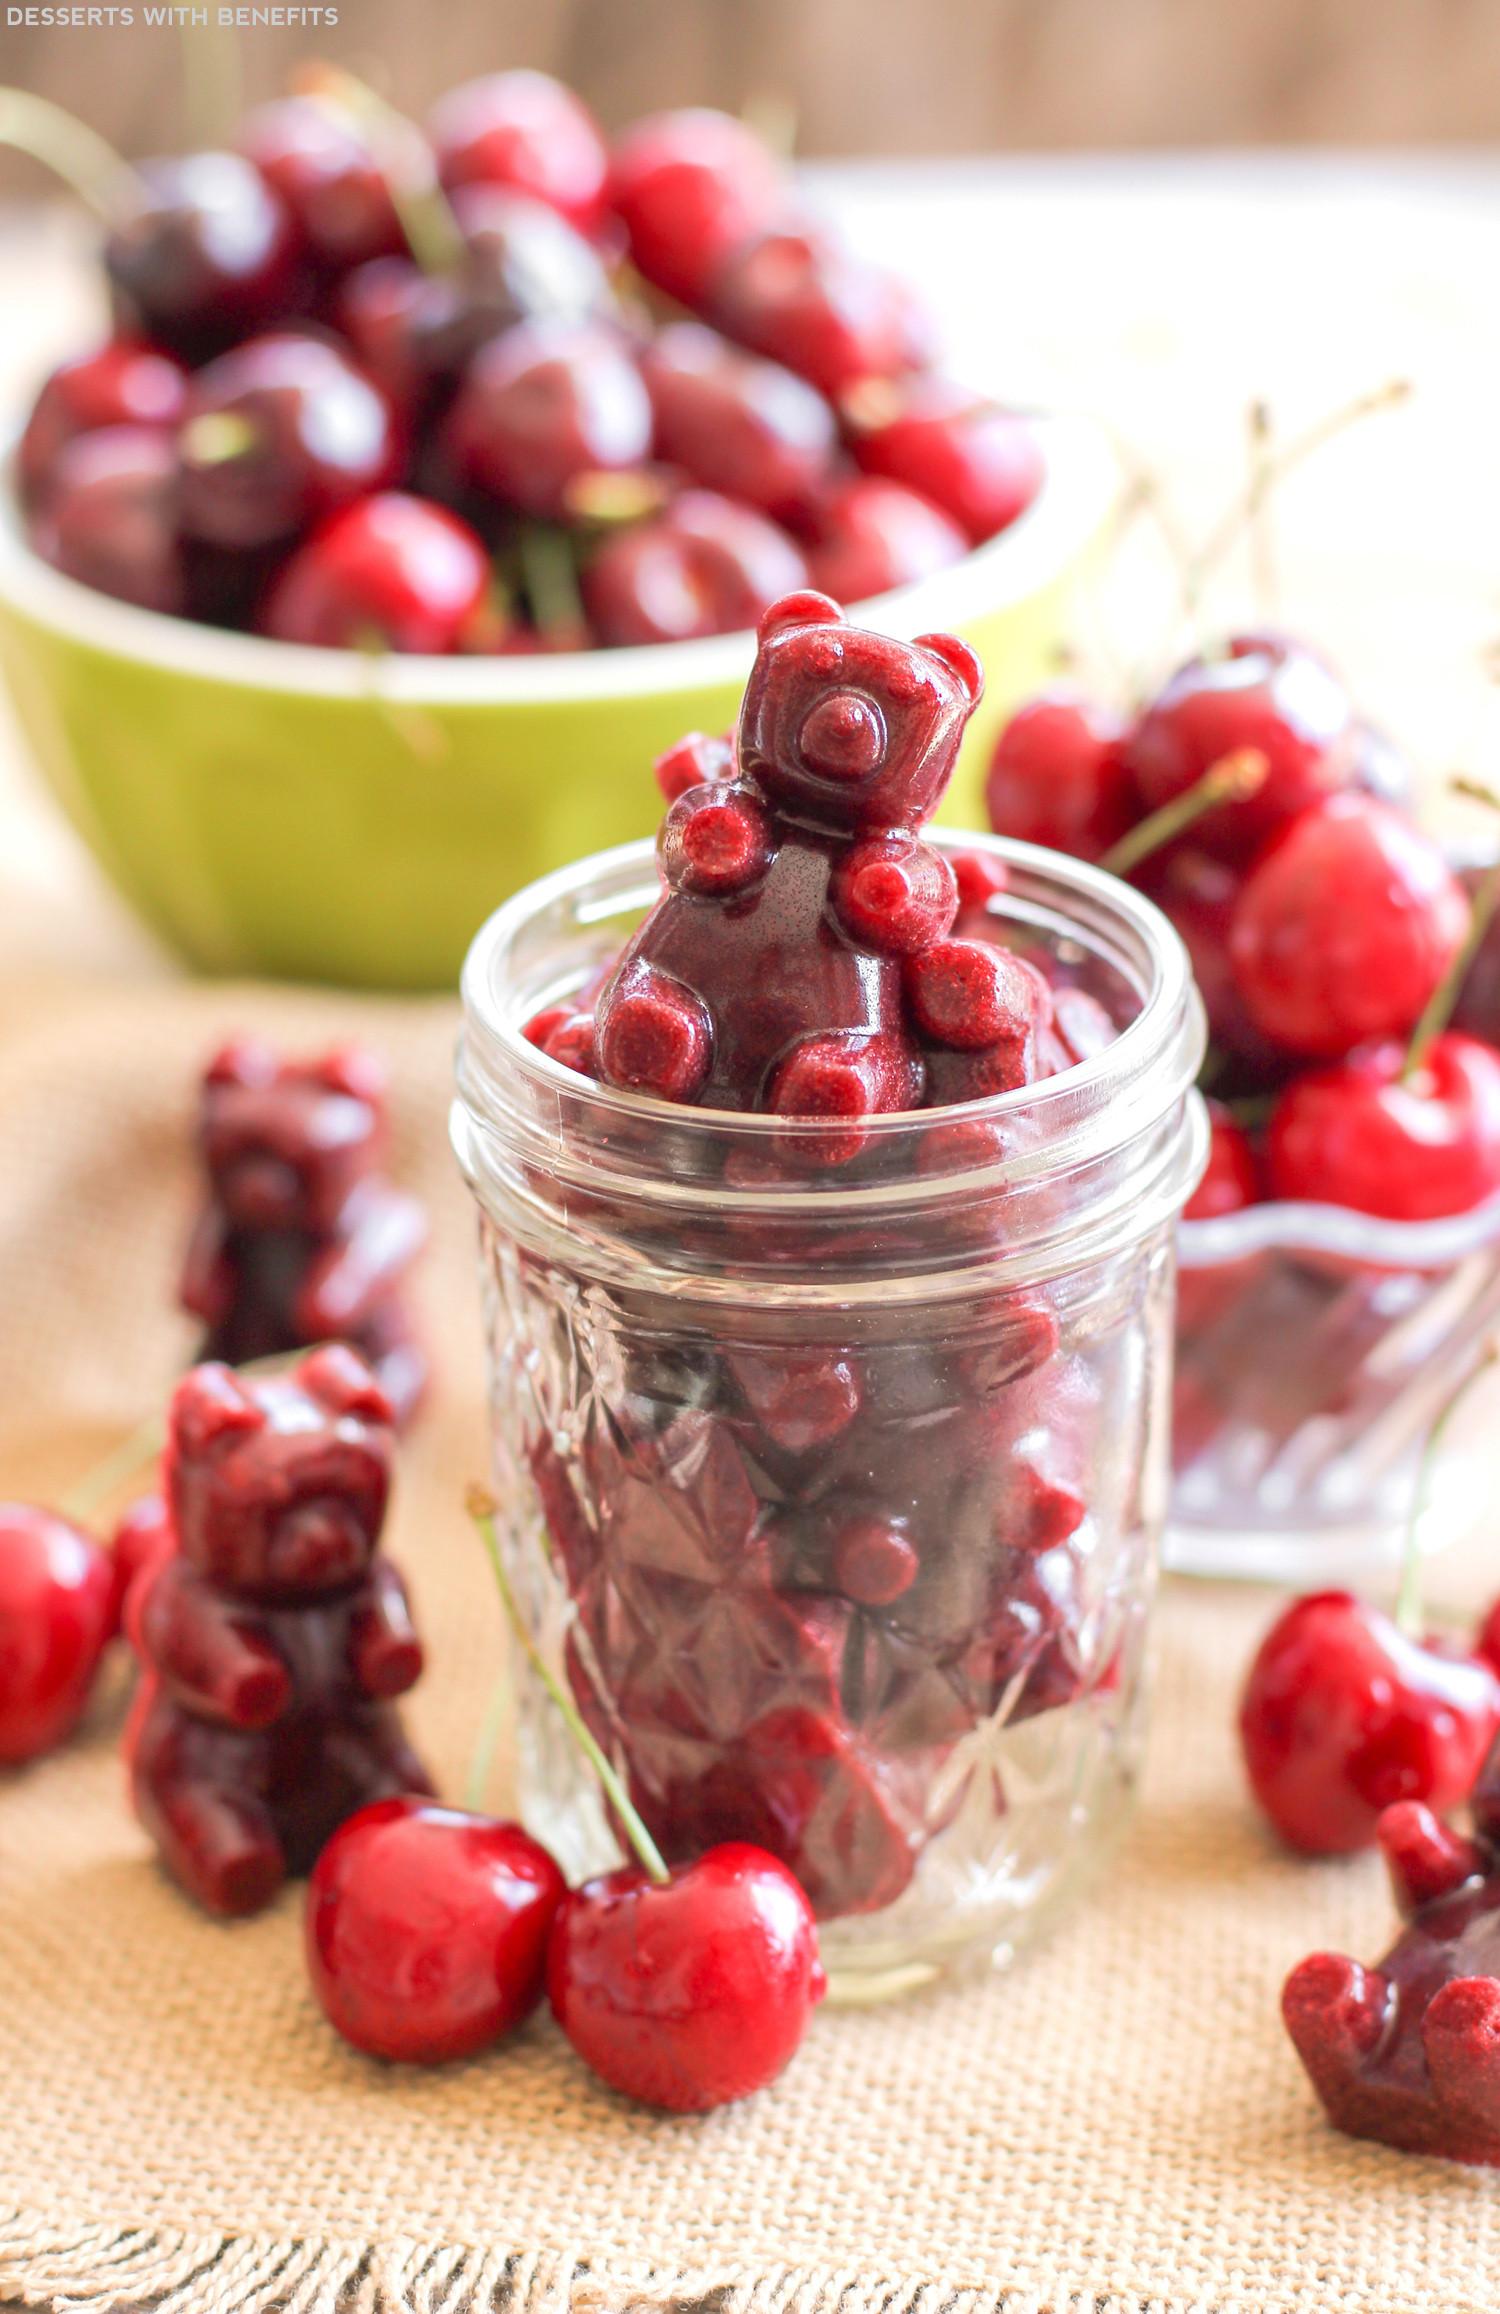 Healthy Fruit Desserts No Sugar  Healthy Very Cherry Fruit Snacks Recipe